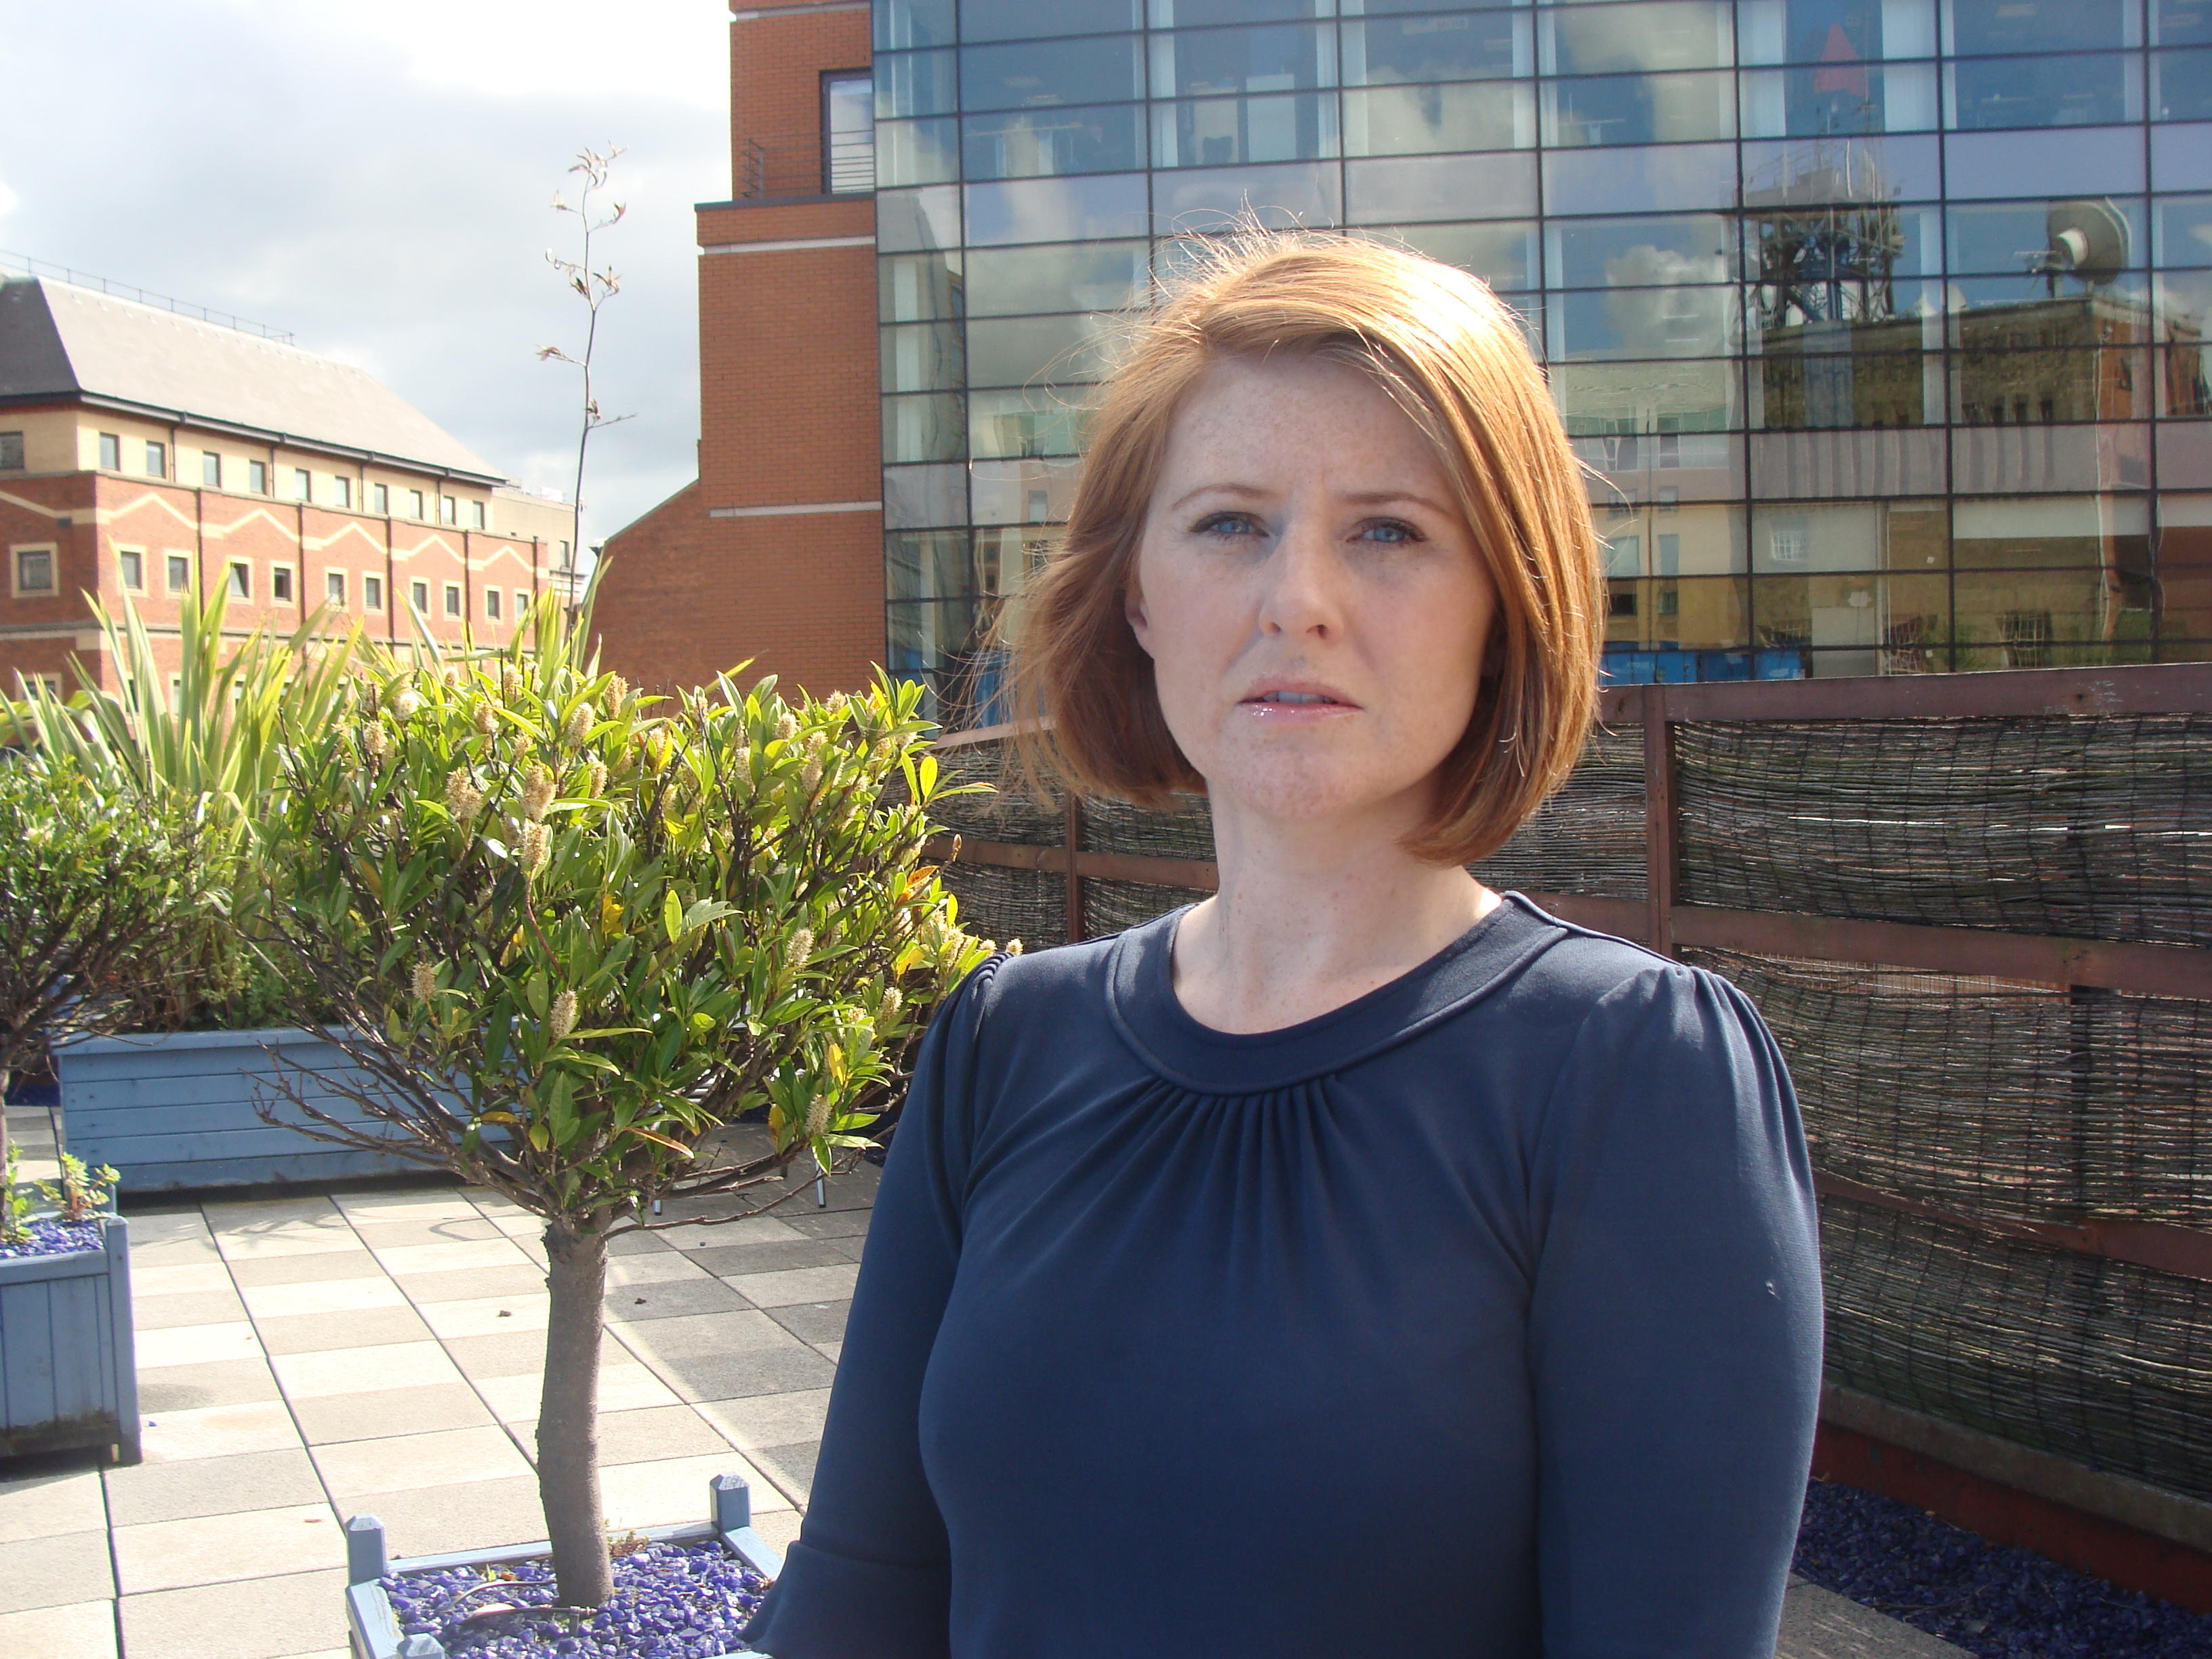 bbc news ni - photo #3